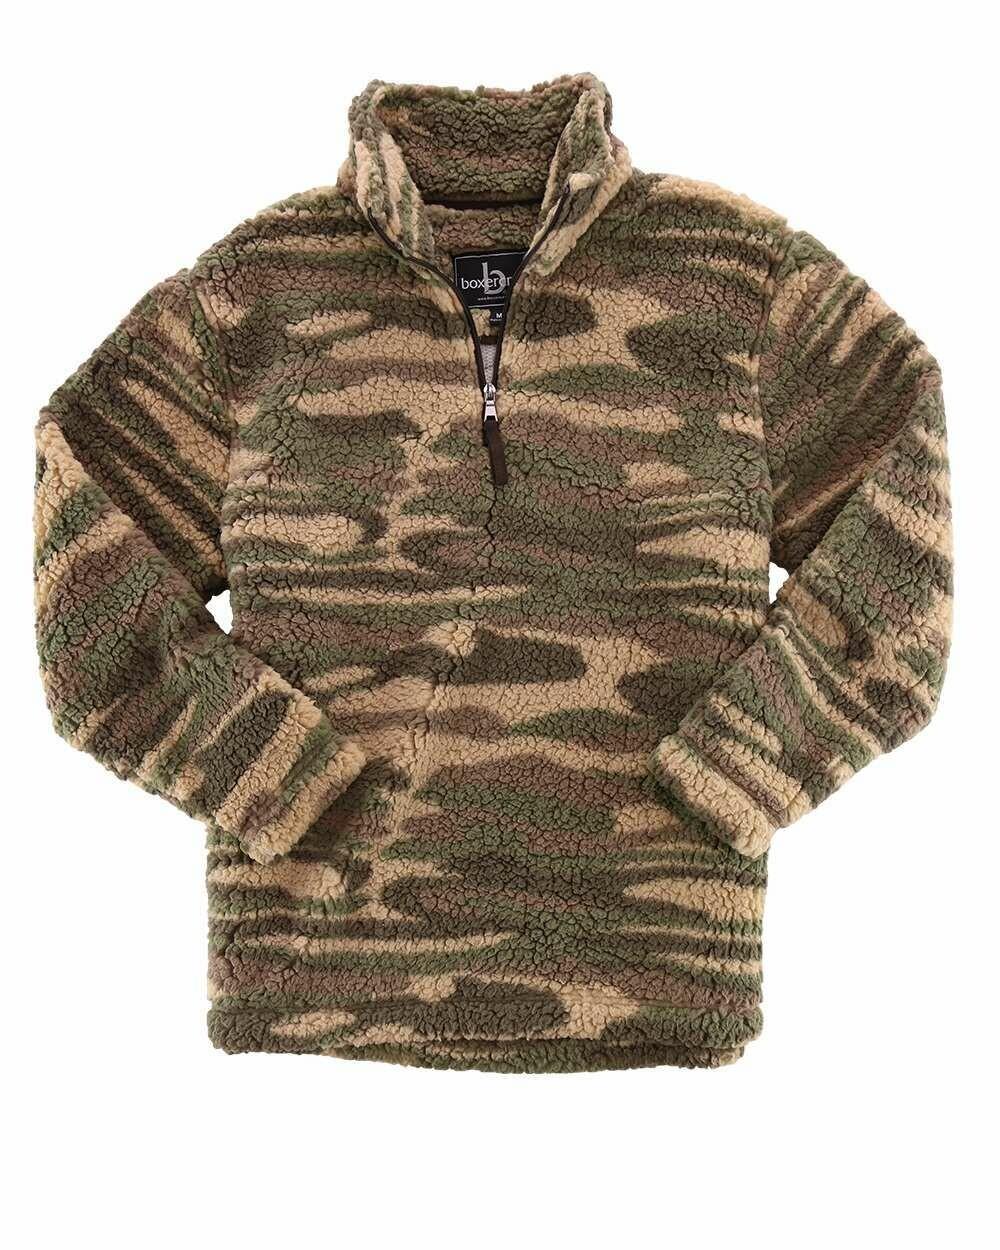 Unisex Camo Sherpa Fleece Quarter-Zip Pullover with choice of Douglass Logo or Monogram